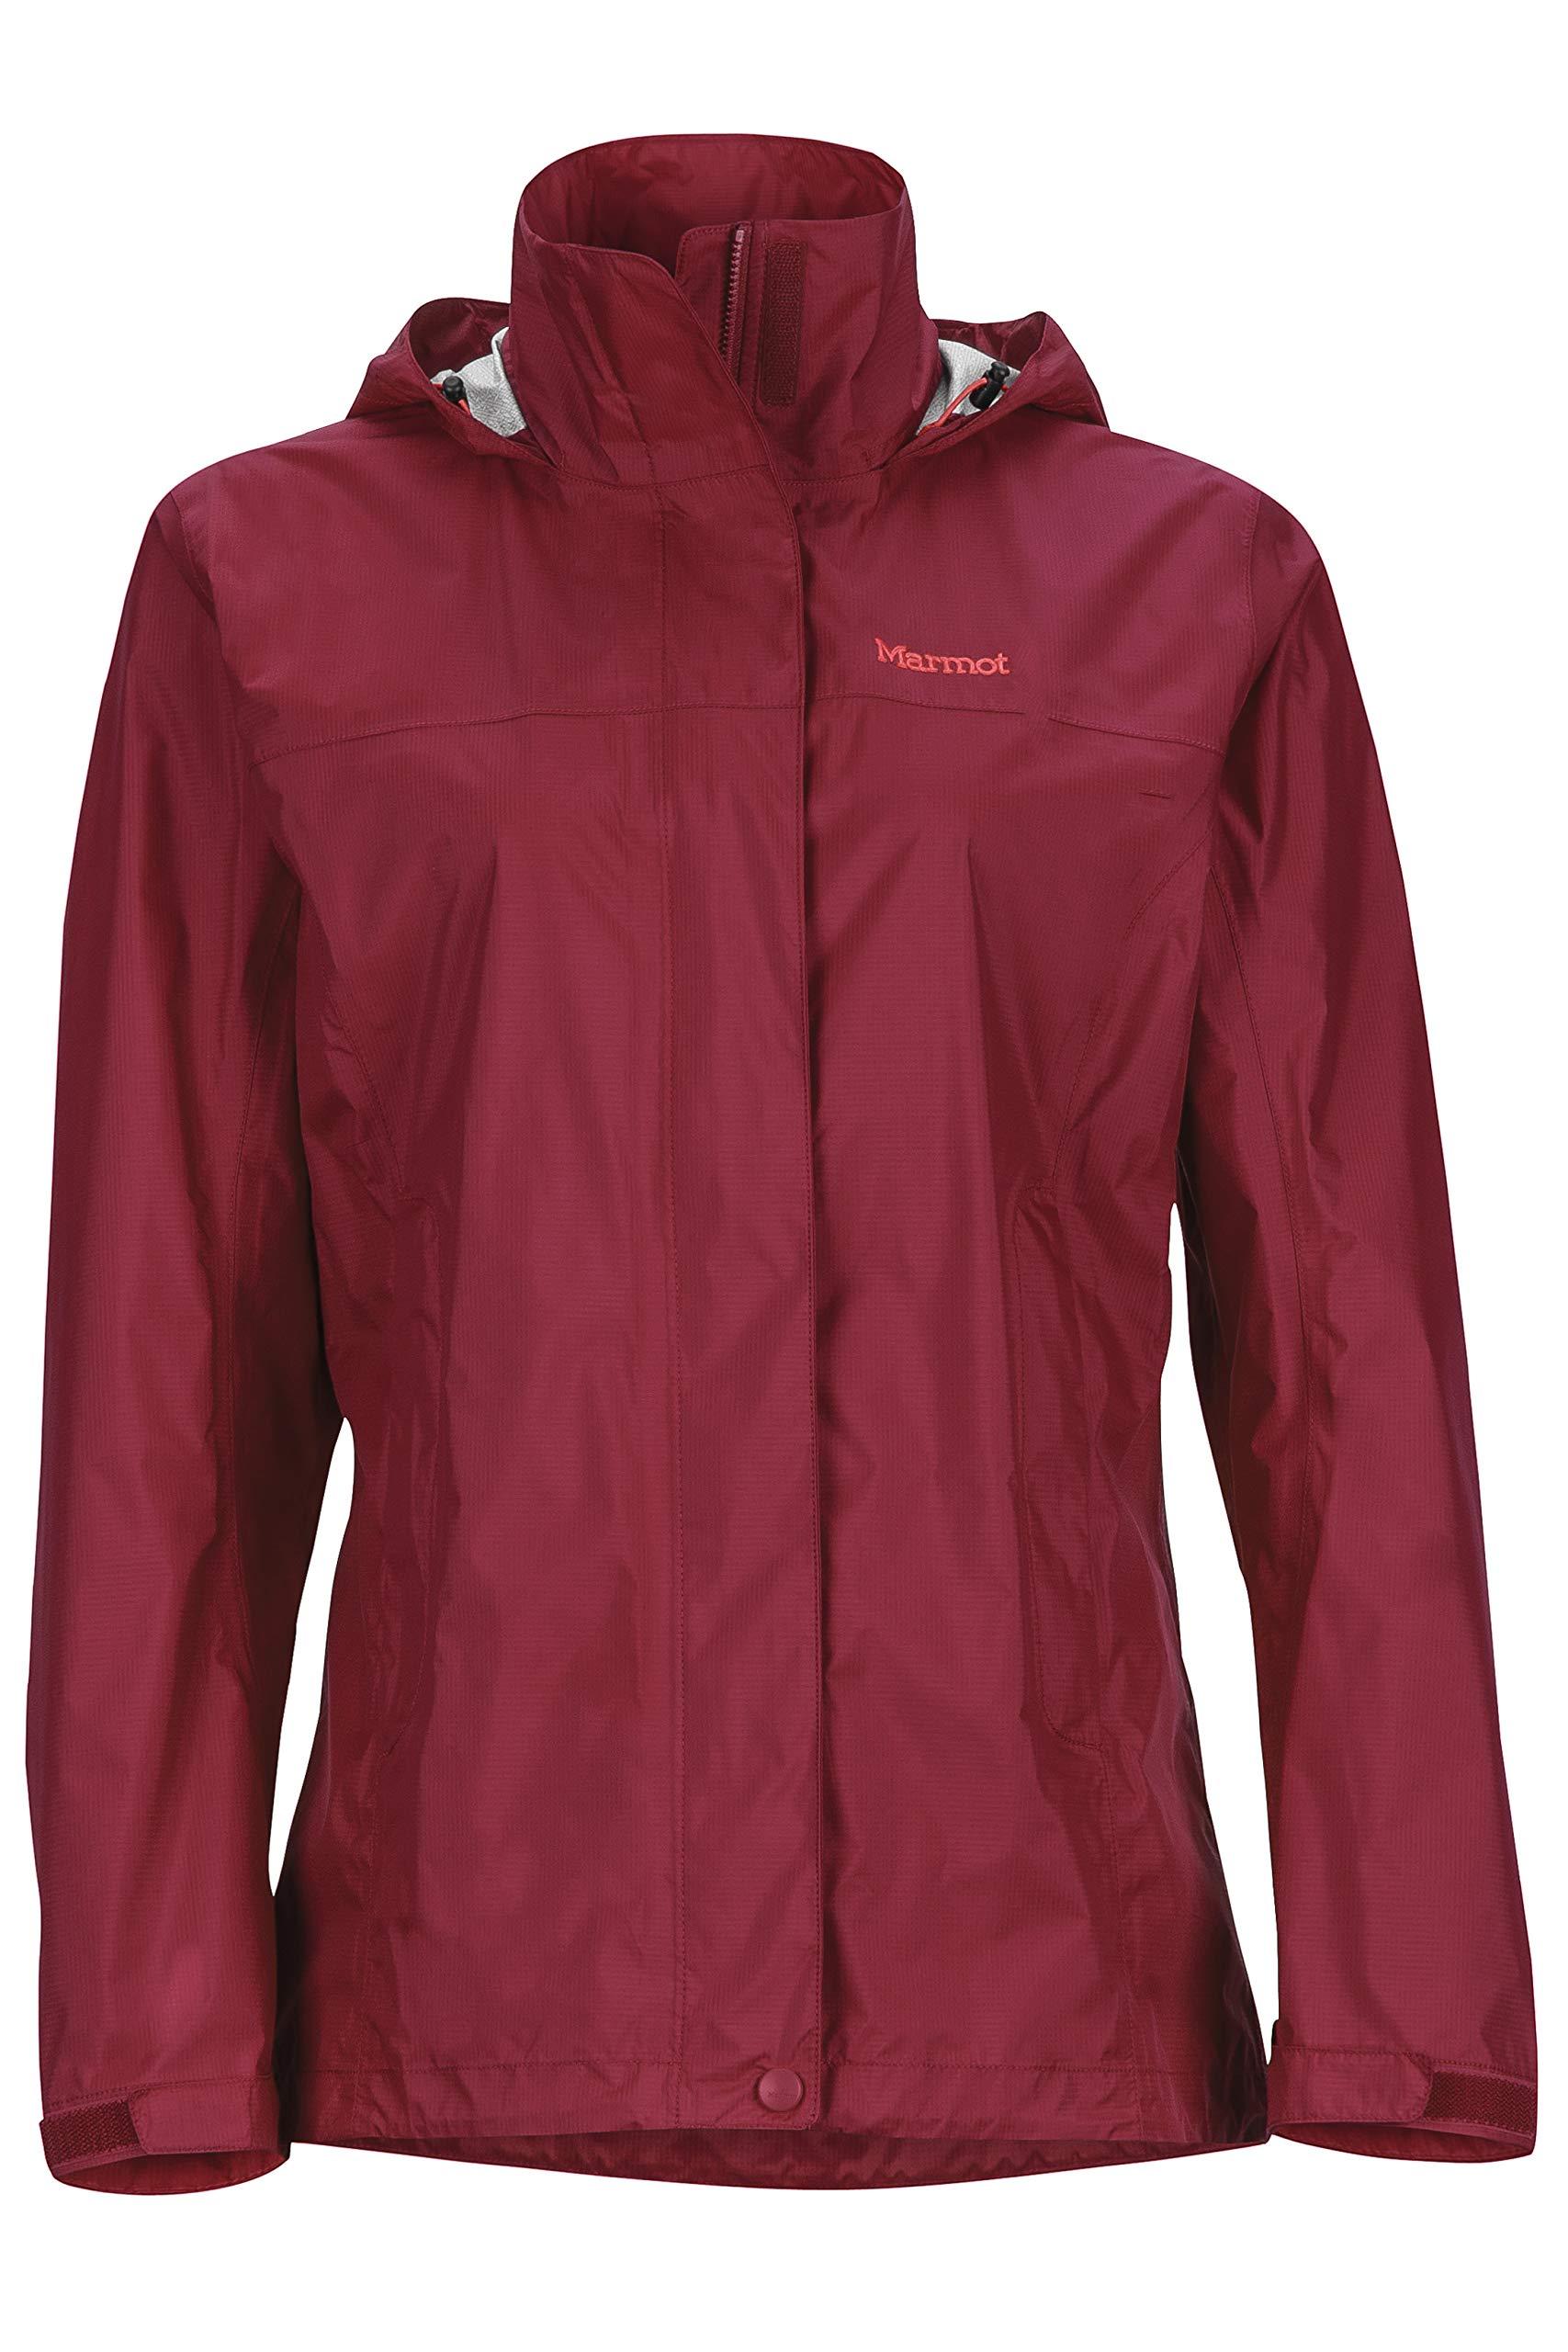 Marmot Women's Precip Jacket, Sienna Red, X-Small